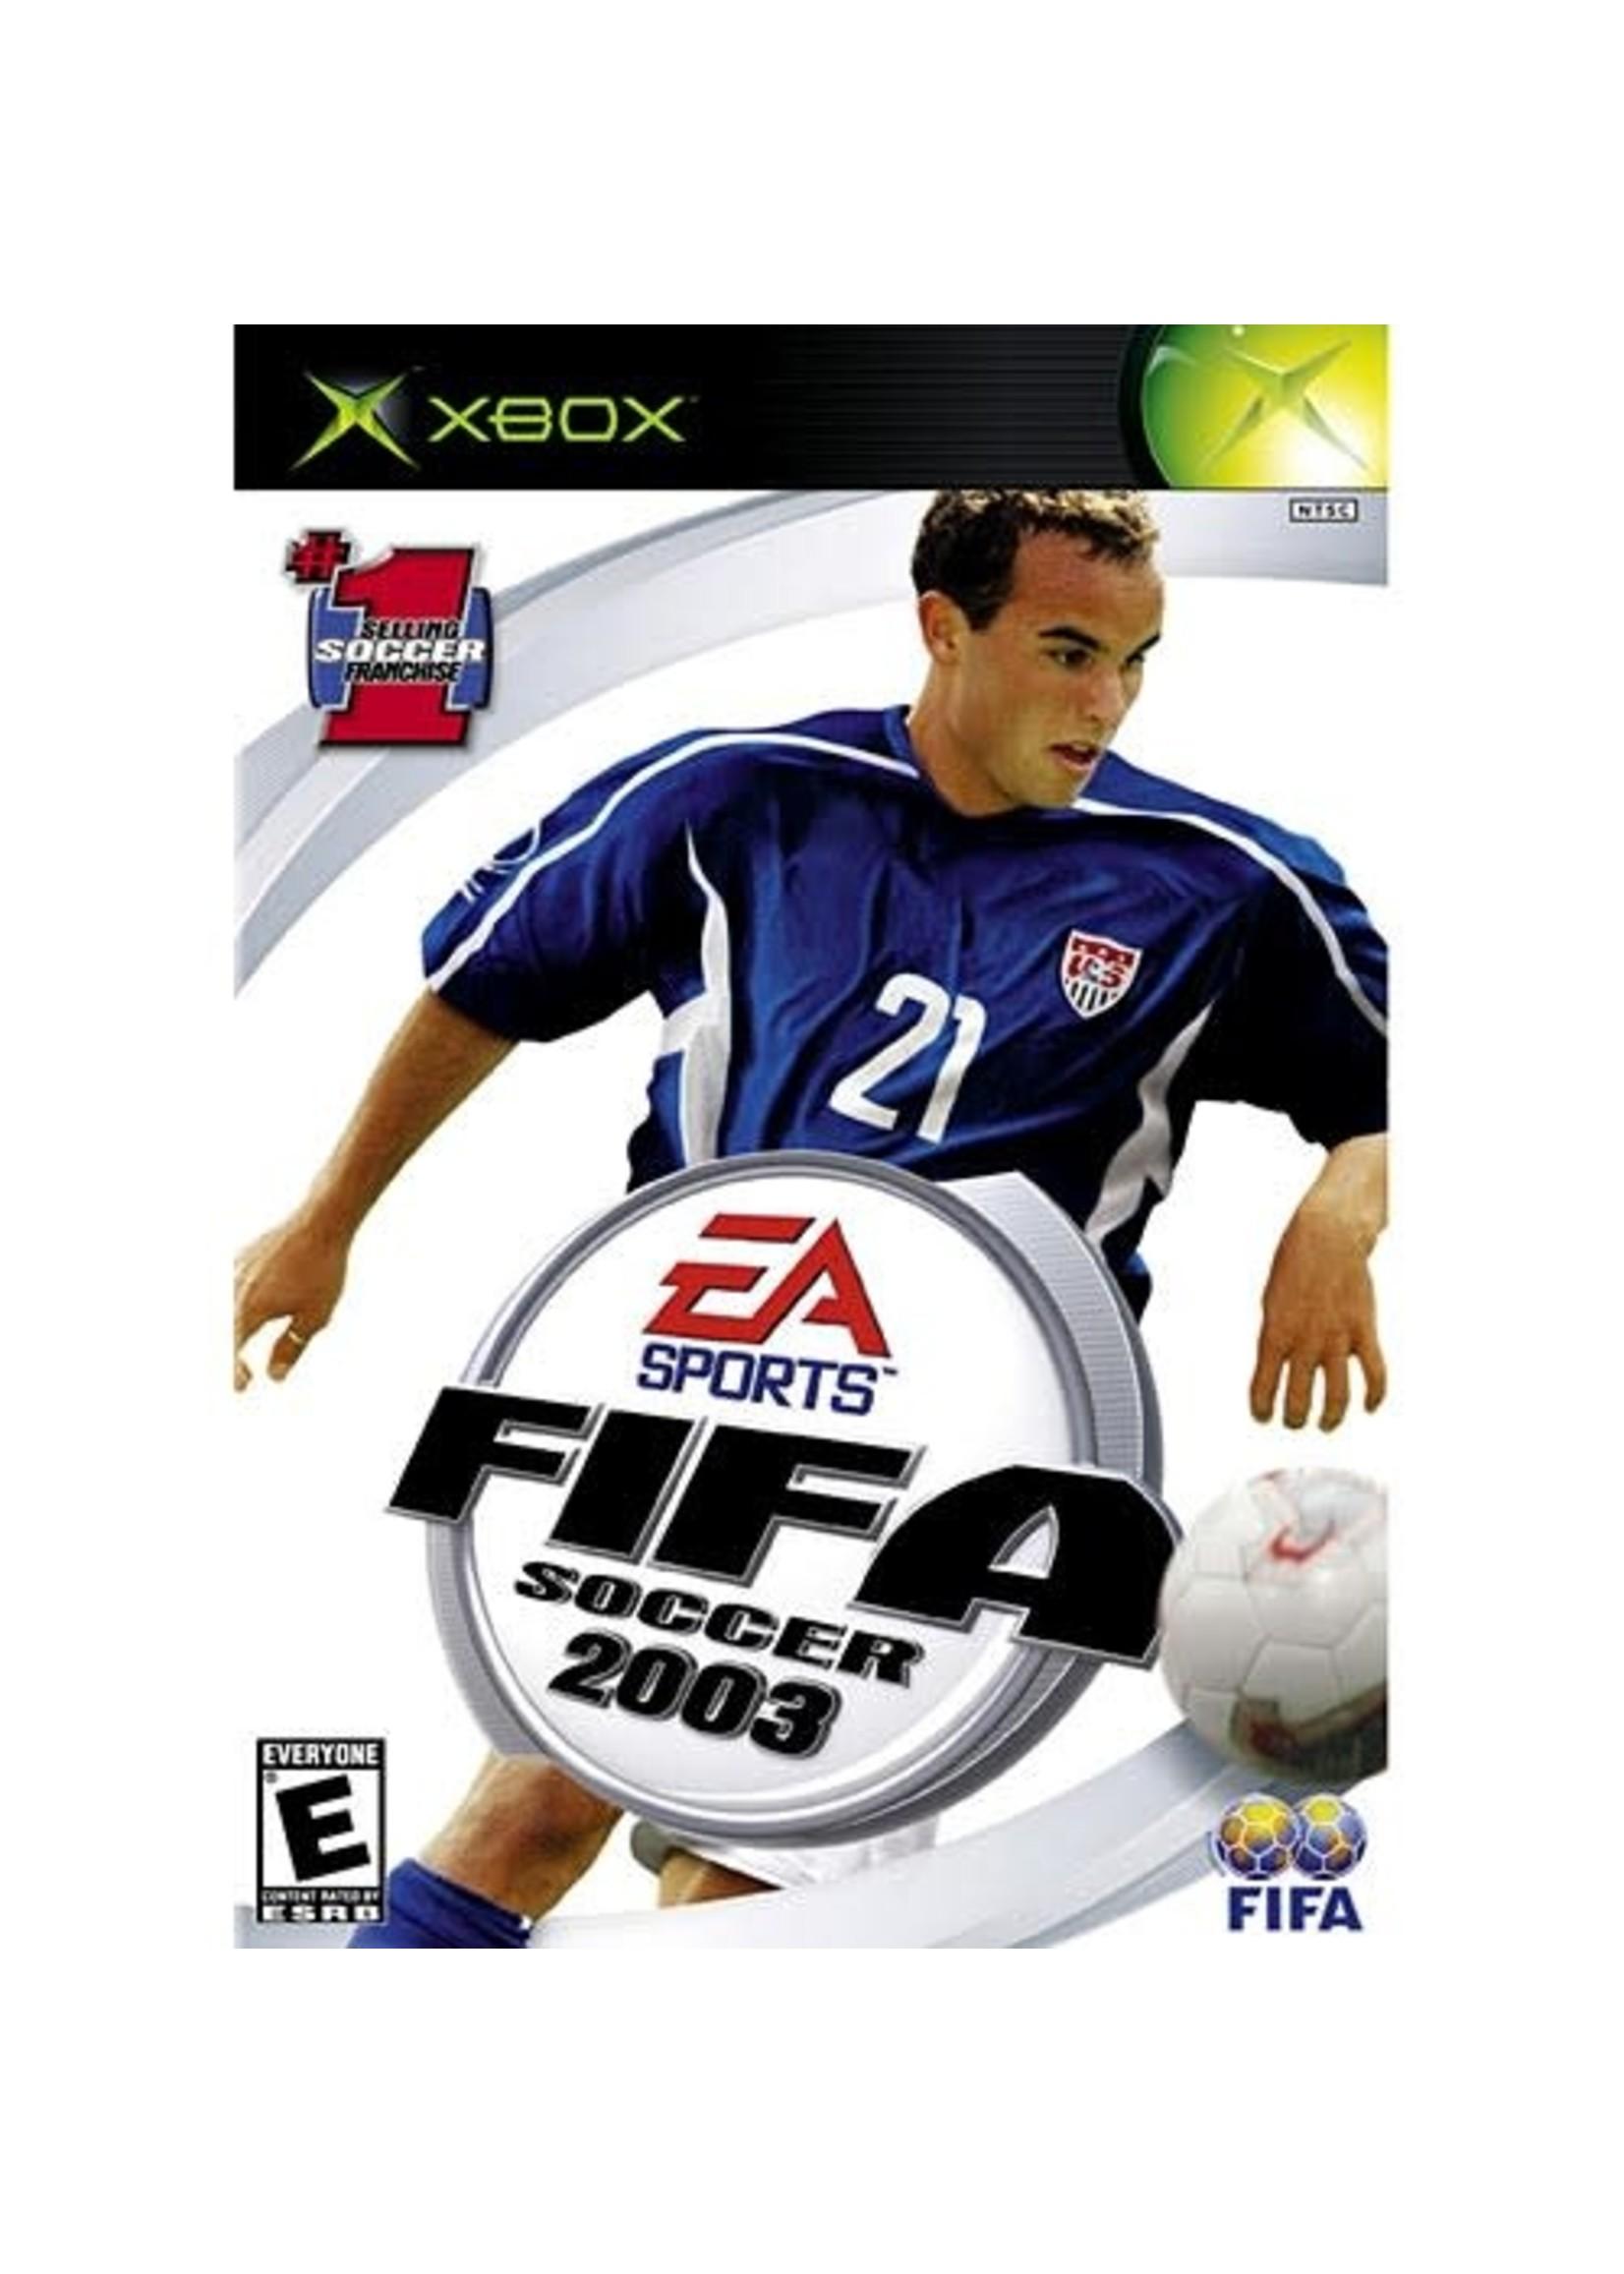 FIFA 2003 - XBOX PrePlayed